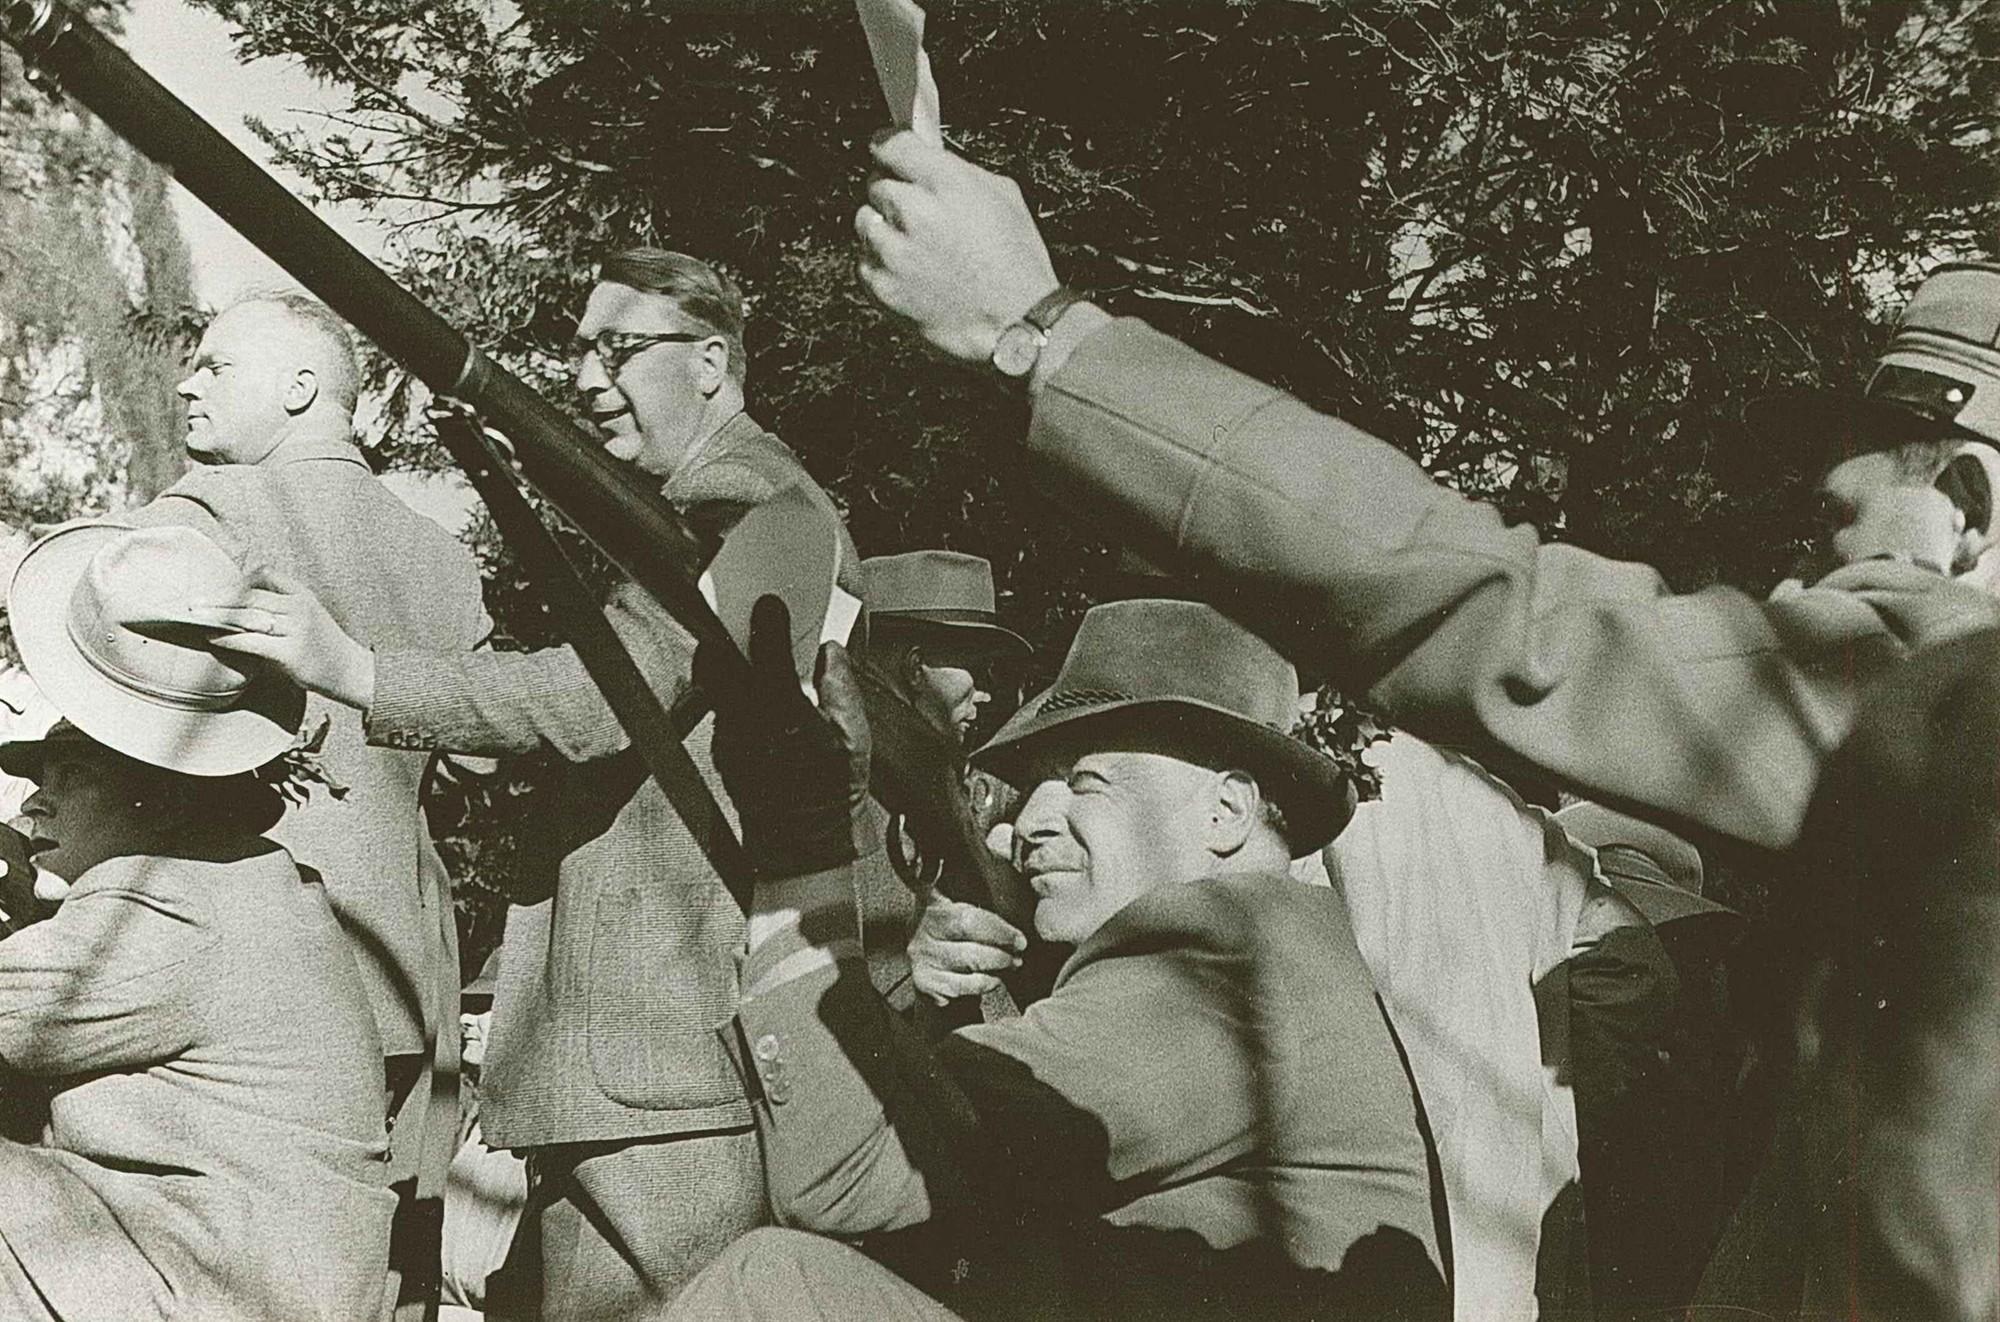 Rütli 1952 v.l. Ernst Lauer, Dr. Franz Huber, Dr. Adelbert Eckstein, Dr.h.c. Heinrich Küng, Dr. Heini Küng